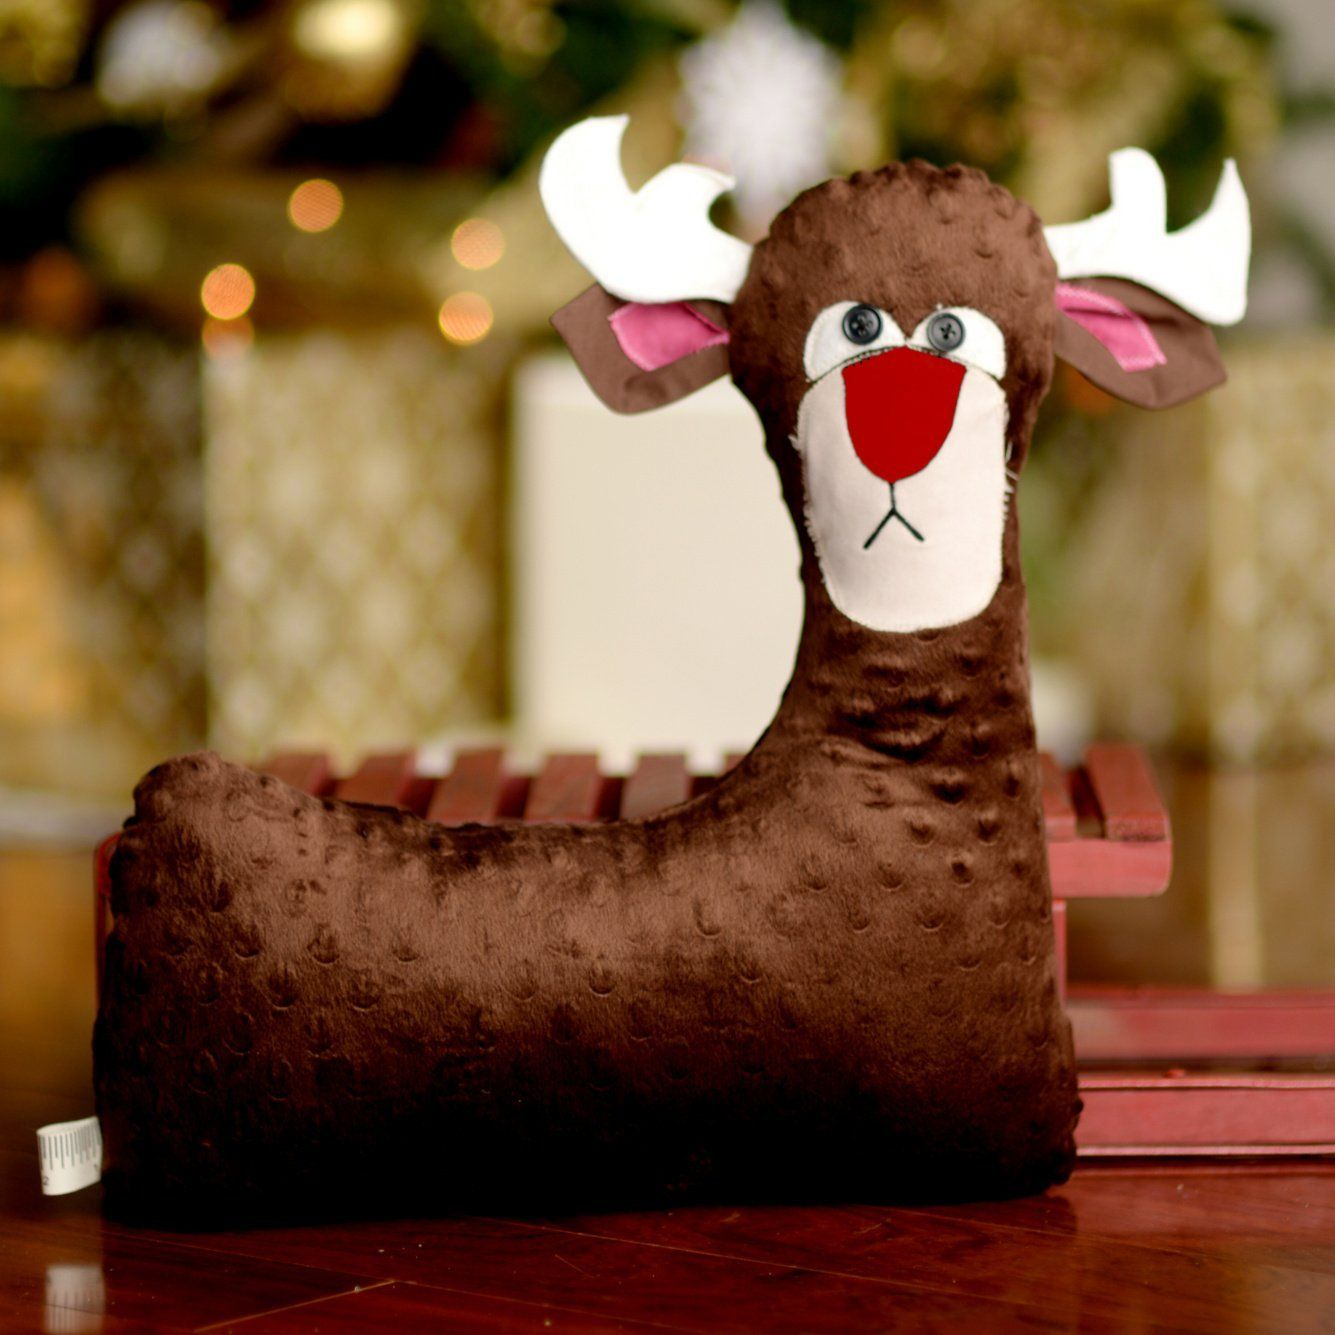 Deer Stuffed Animal Gift for Boy under 40 - red